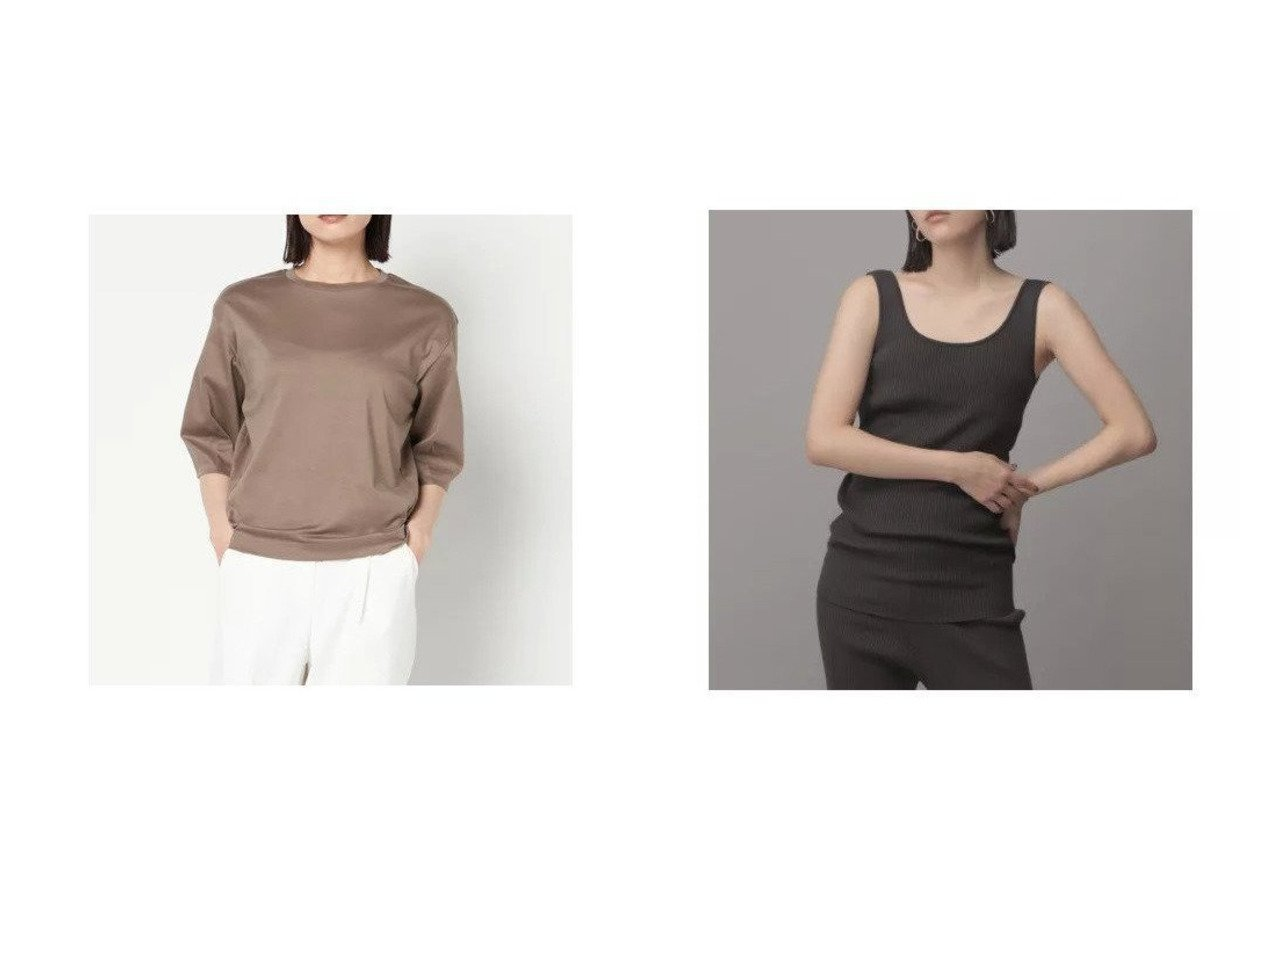 【eer:/エール】のコットン コクーンスリーブ カットソー&【Chaos/カオス】のCR16Gインプレリブタンクトップ 【トップス・カットソー】おすすめ!人気、トレンド・レディースファッションの通販   おすすめで人気の流行・トレンド、ファッションの通販商品 メンズファッション・キッズファッション・インテリア・家具・レディースファッション・服の通販 founy(ファニー) https://founy.com/ ファッション Fashion レディースファッション WOMEN トップス・カットソー Tops/Tshirt シャツ/ブラウス Shirts/Blouses ロング / Tシャツ T-Shirts カットソー Cut and Sewn カットソー スリーブ 半袖 シンプル ストレッチ タンク デコルテ フィット 今季 洗える |ID:crp329100000031810